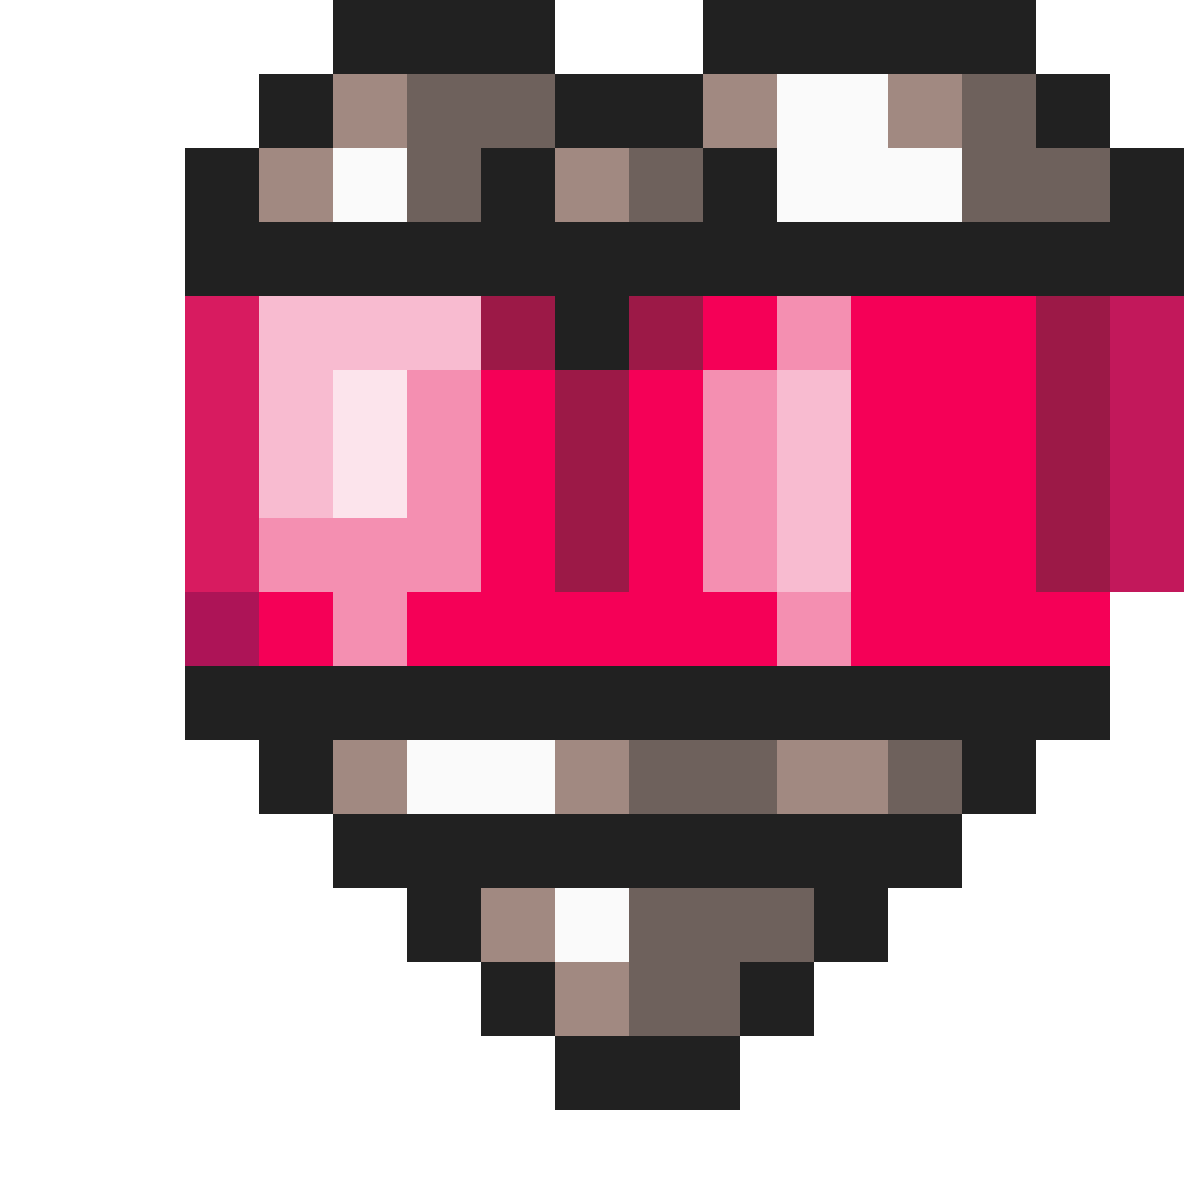 Heart Tank by ArtLoverIris